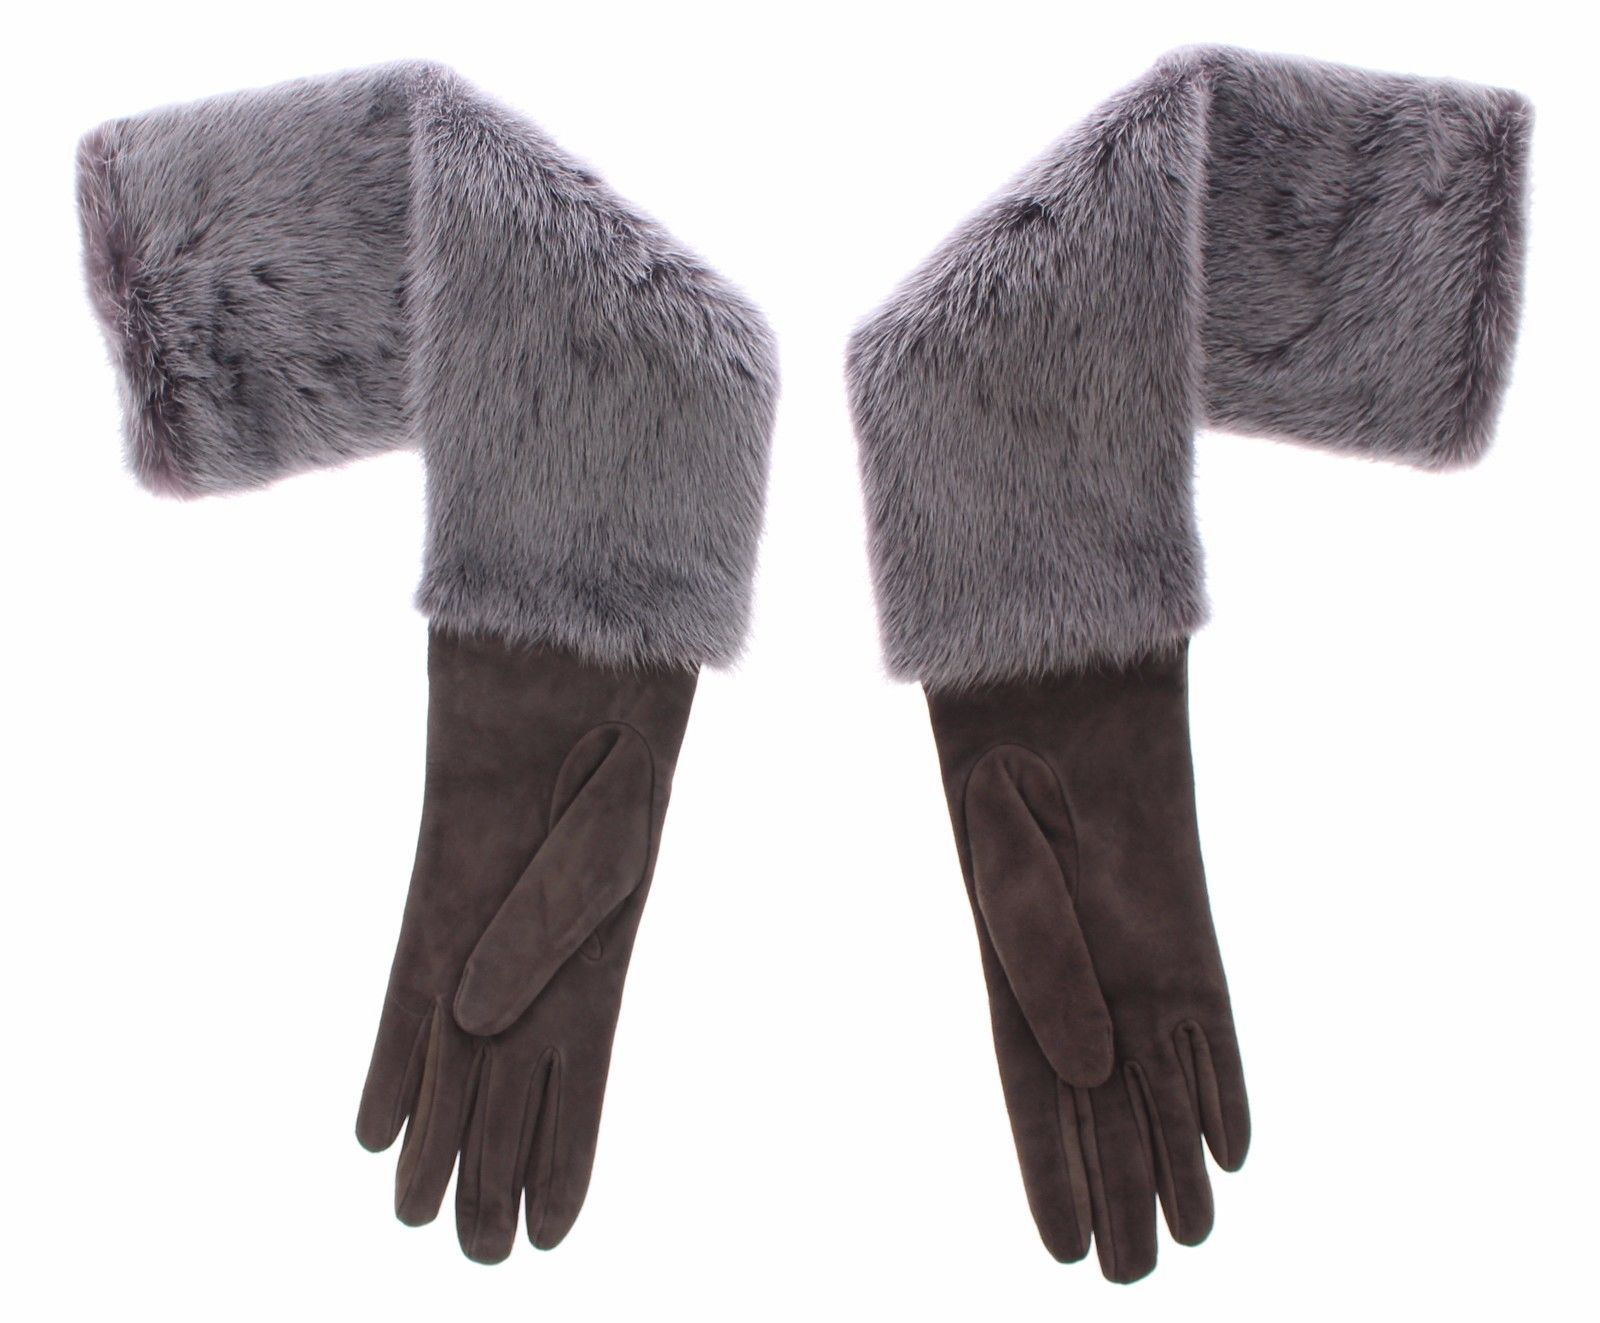 Dolce & Gabbana Women's Mink Fur Lambskin Suede Leather Gloves Gray MOM11434 - 8   M